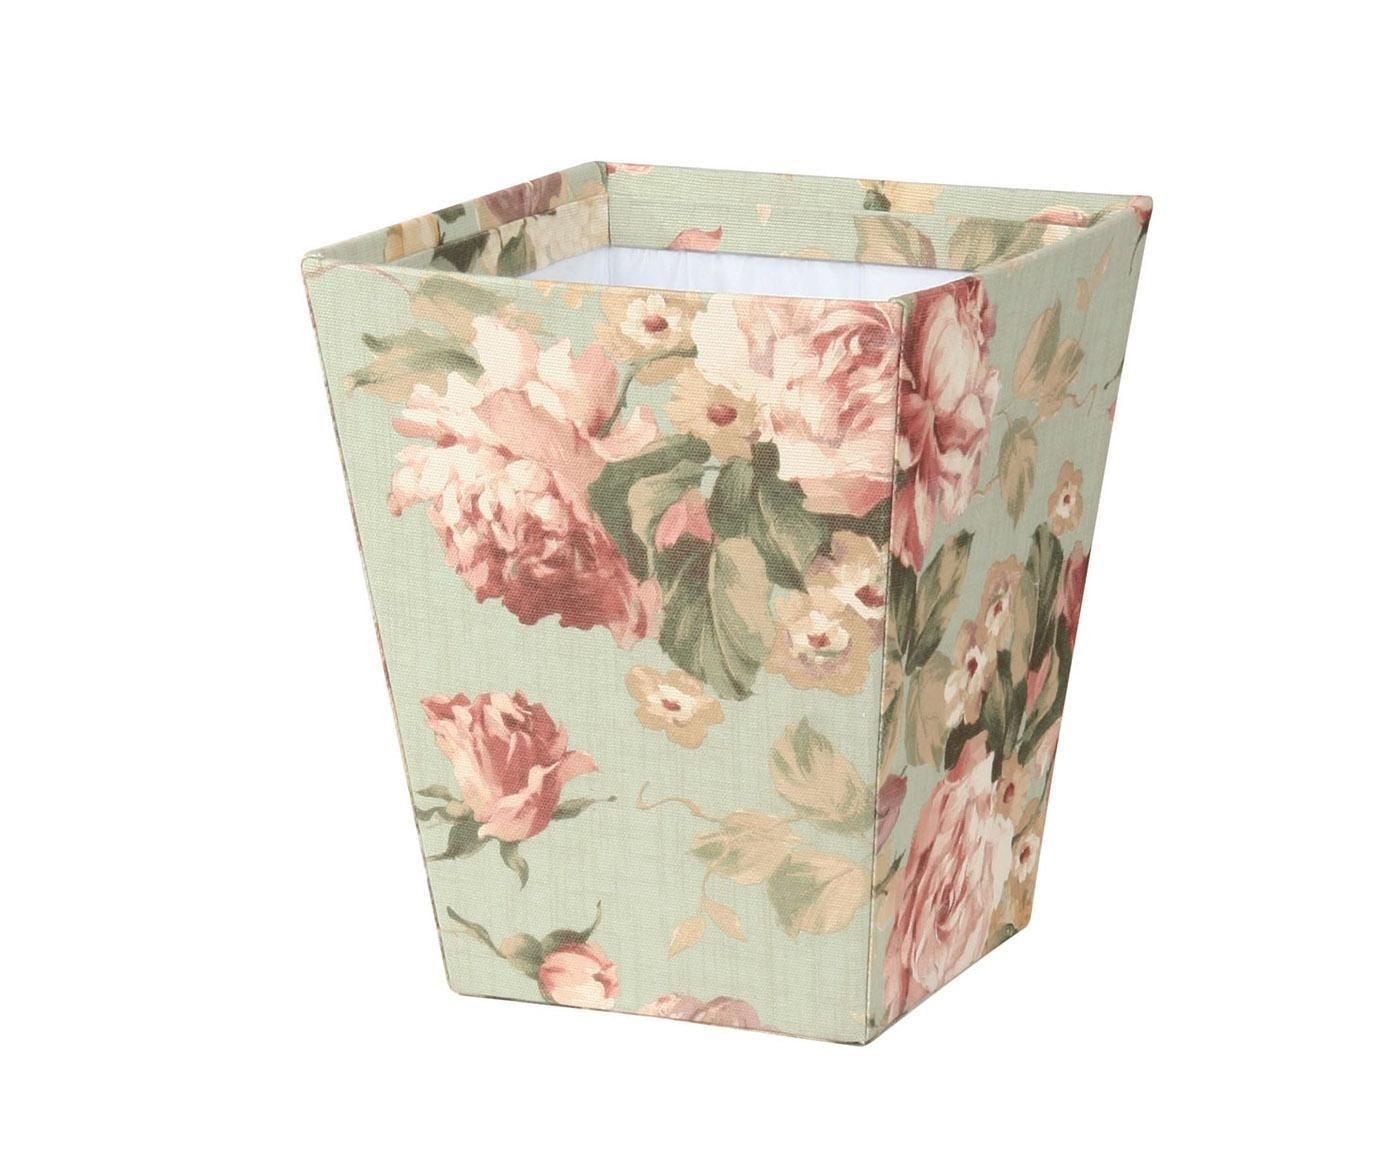 Appartment D Amour Kosz Lucia 79 Nasza Cena 110 Cena Det Shabby Chic Flowers Wastepaper Basket Waste Basket